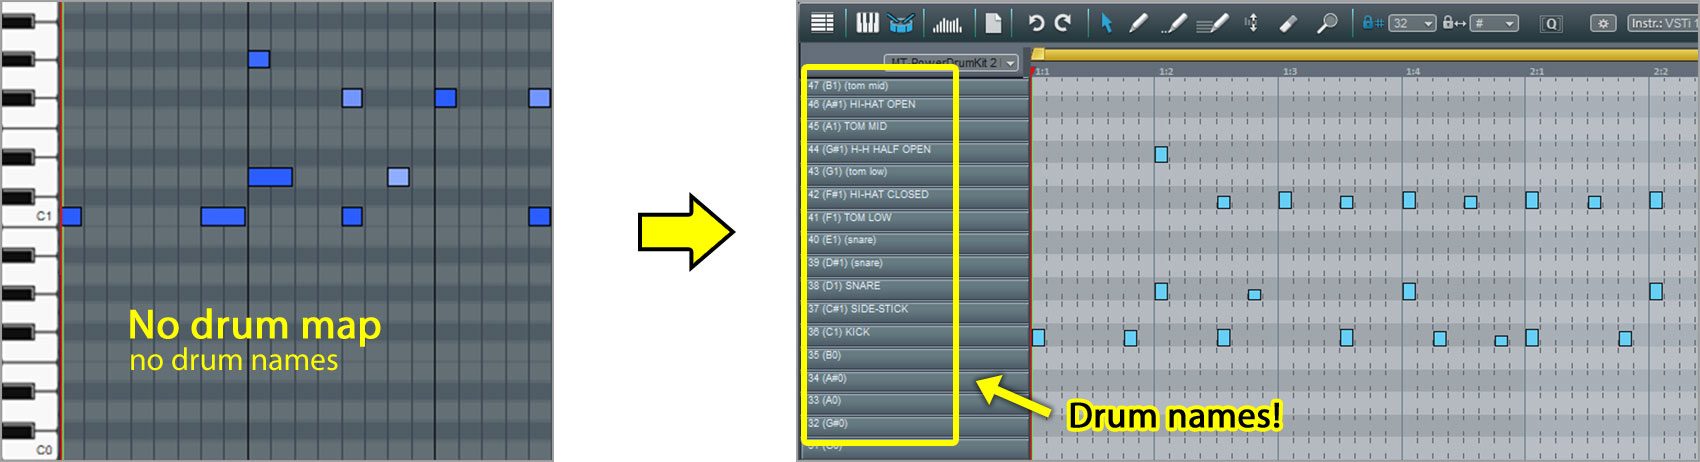 MAGIX Music Maker Drum Map laden on